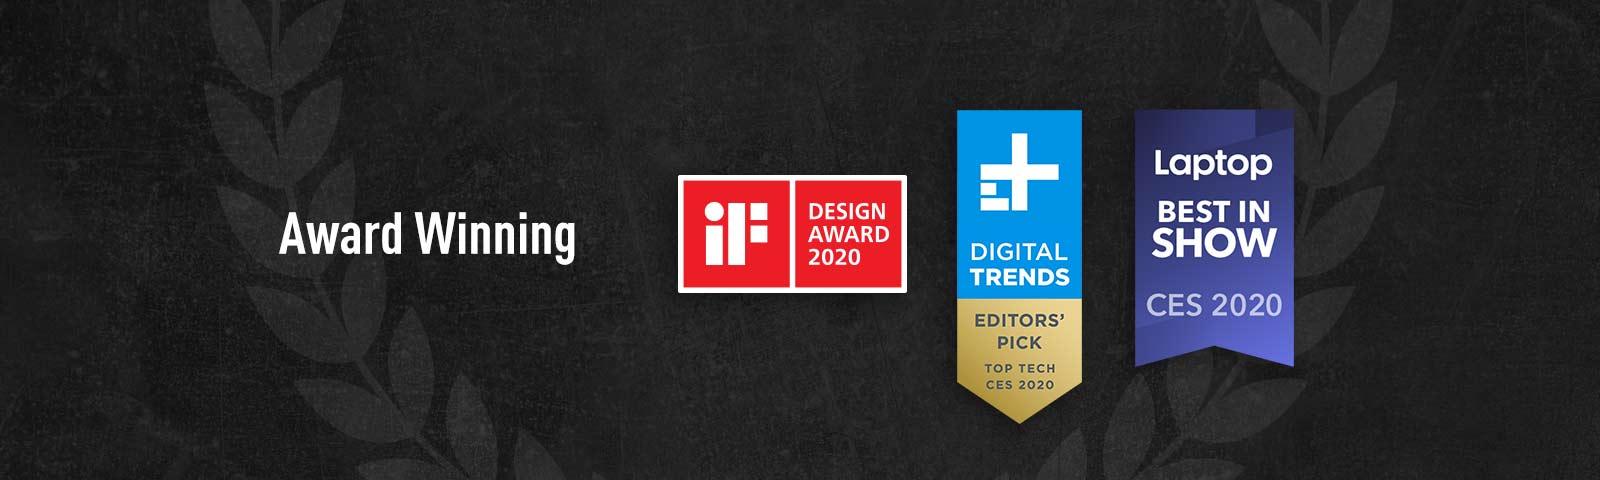 Somes logos of Award.